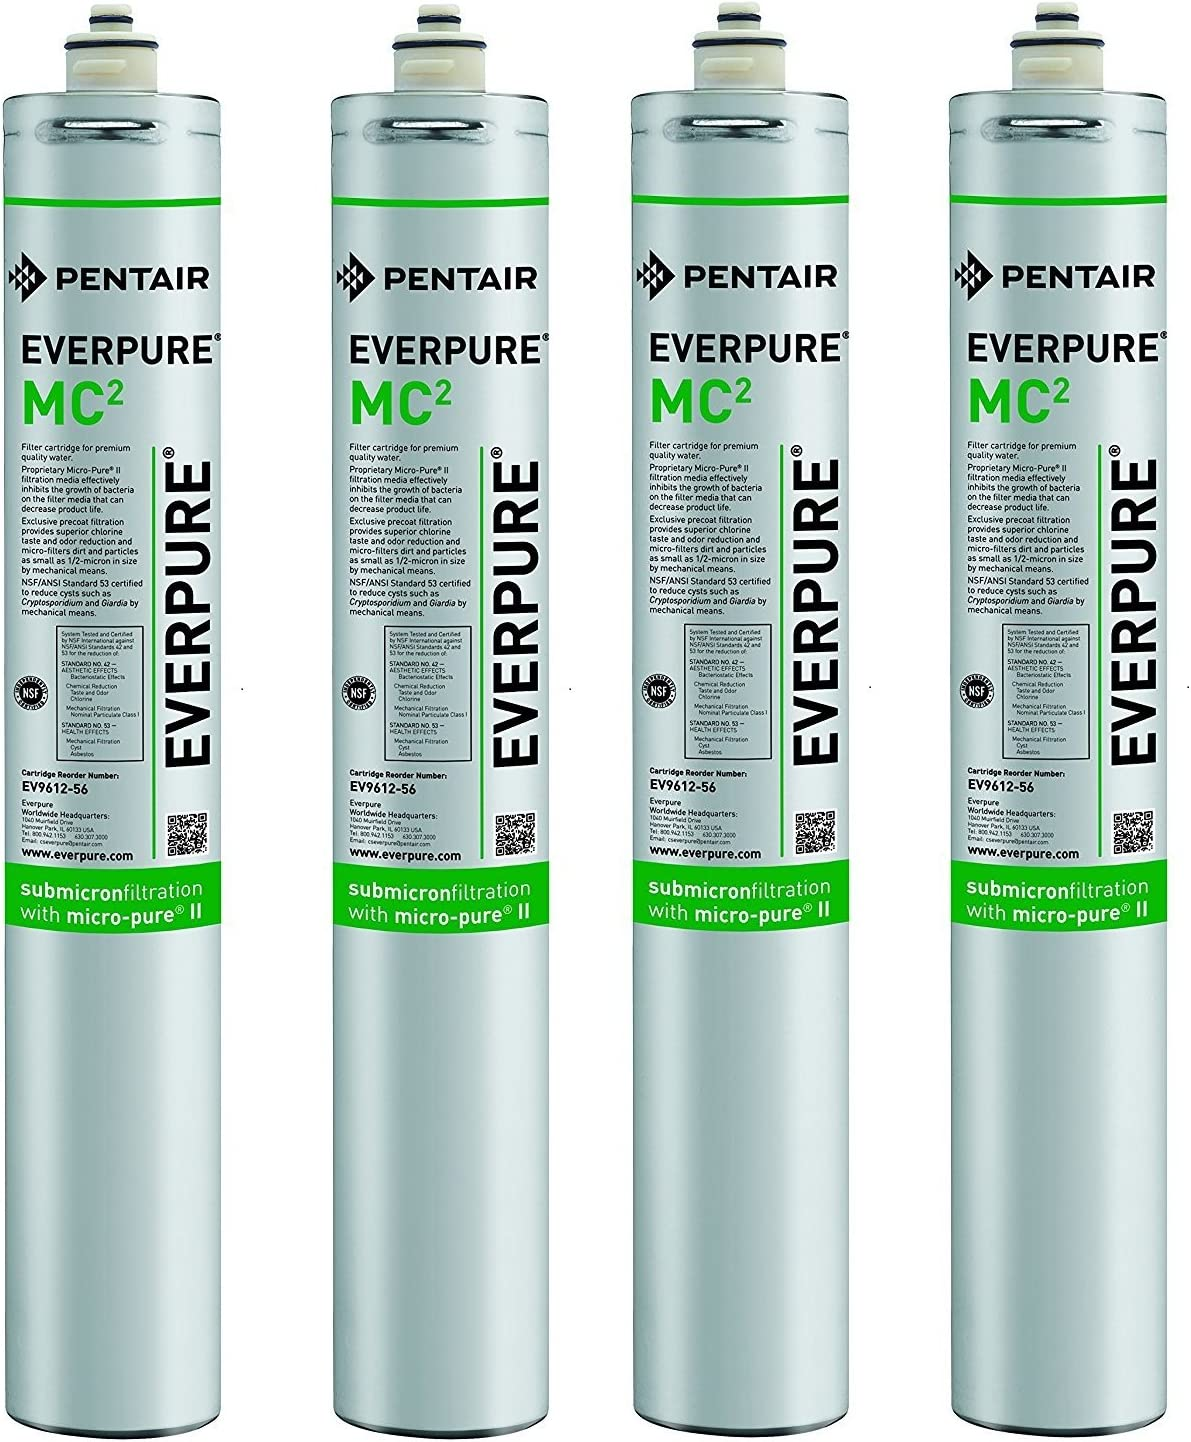 Pack of 4 Everpure EV9612-56 MC2 Filter Cartridge